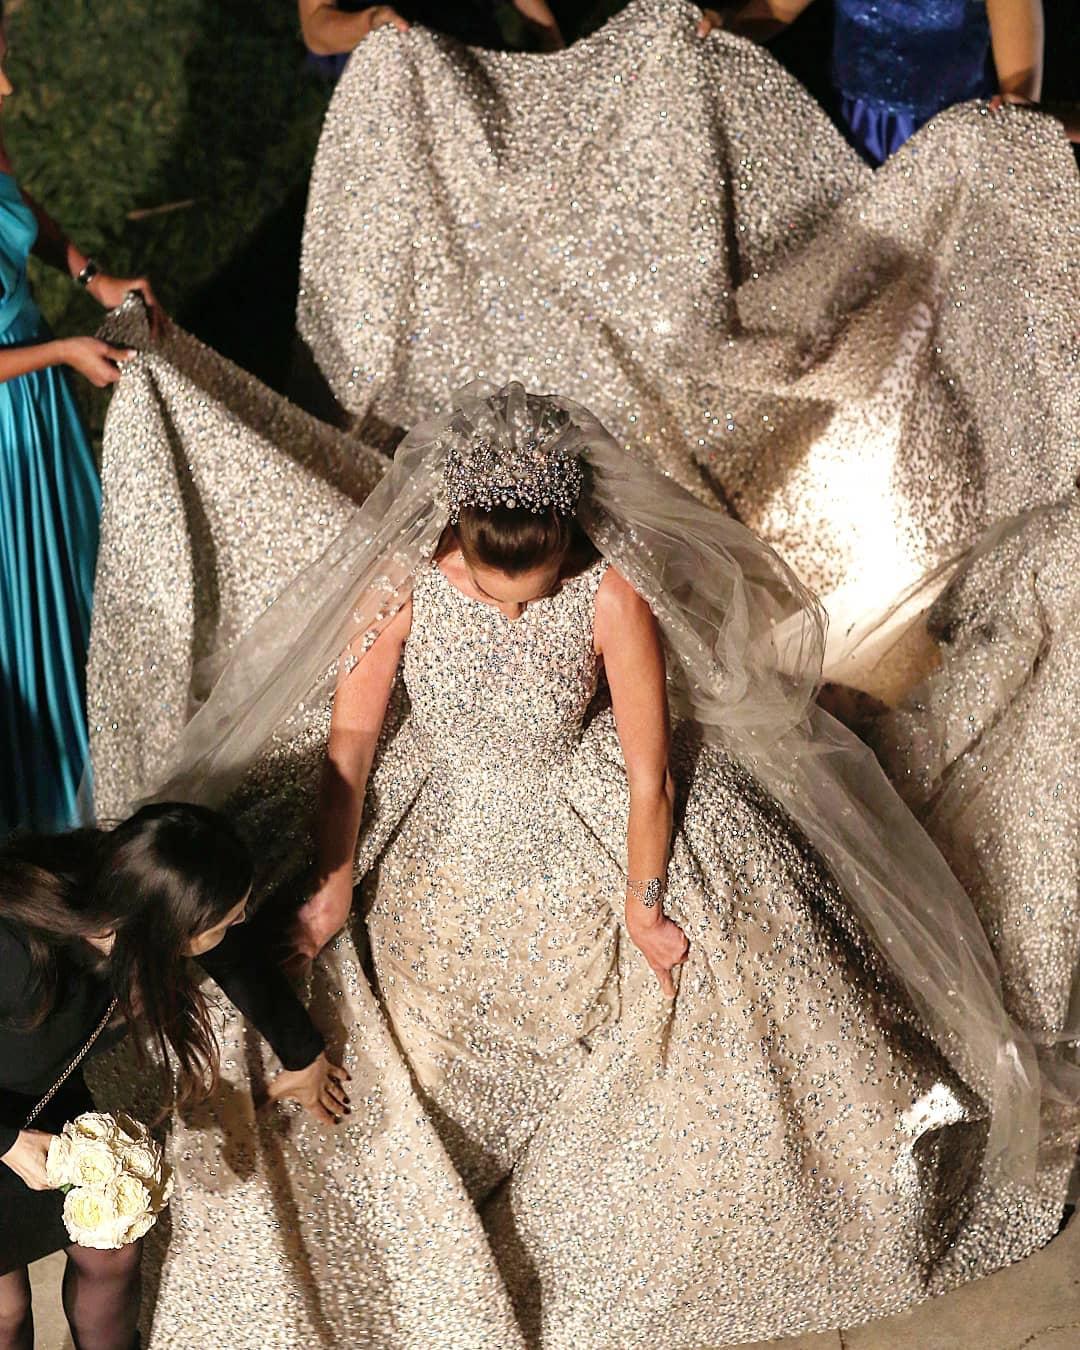 a02067240e54d أفخم فساتين زفاف إيلي صعب تألقت بها عرائس في حفلات زفافهن - Savoir Flair